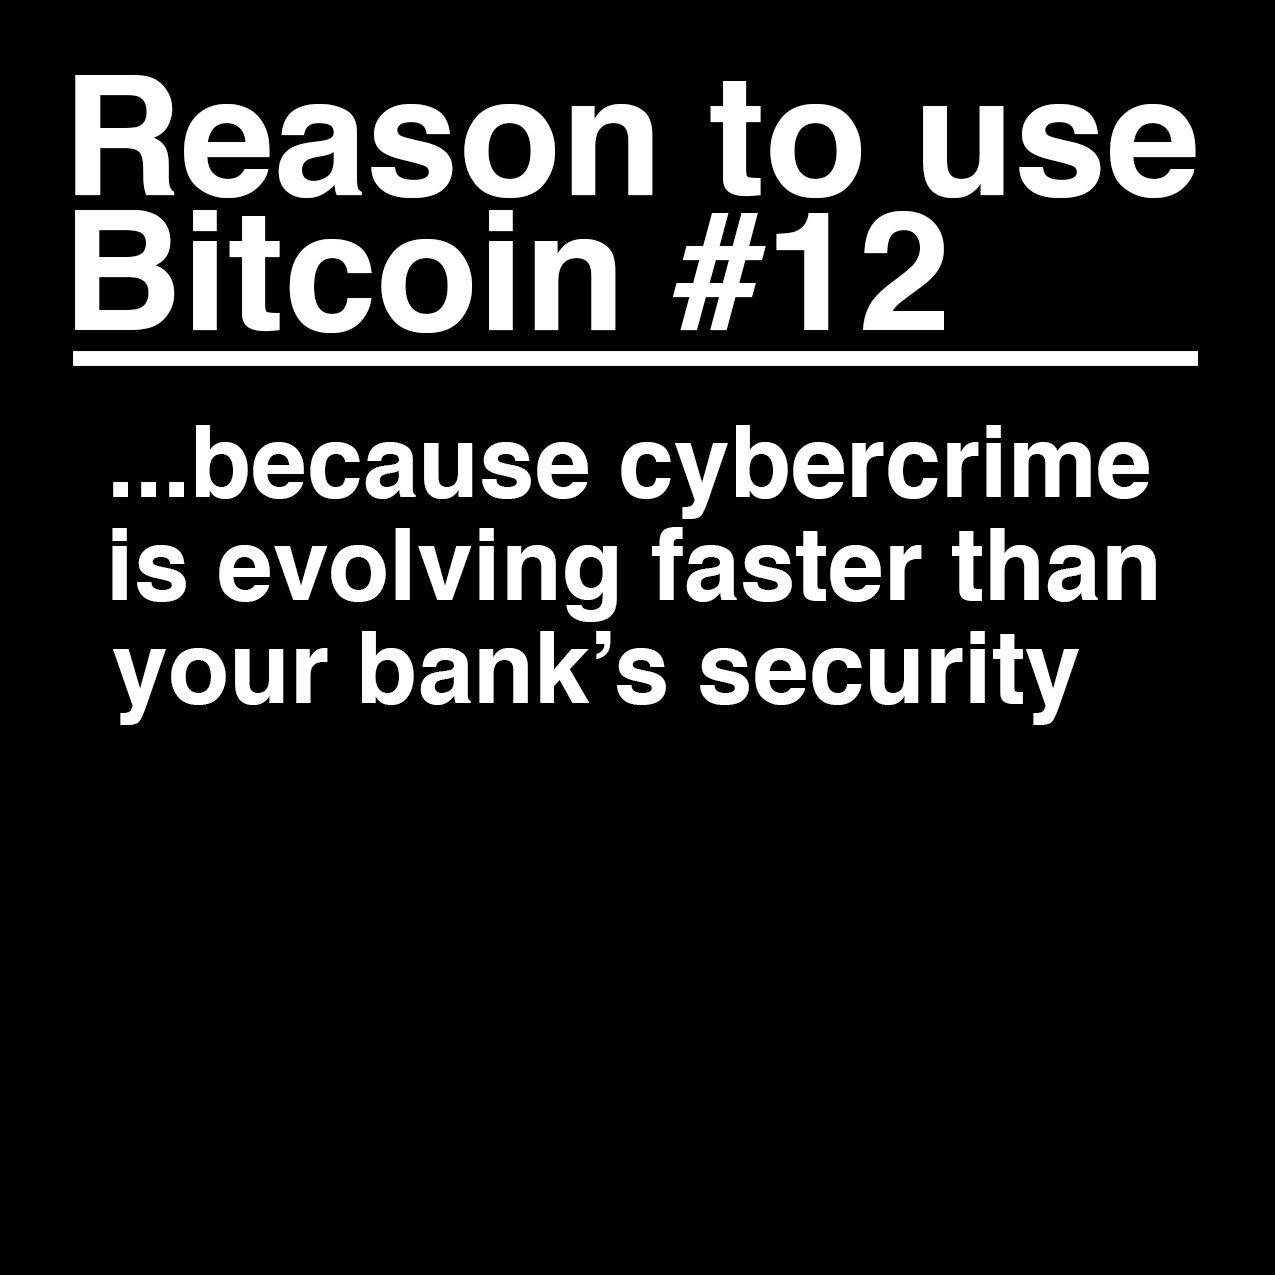 Reason to use Bitcoin 12: Cybercrime is evolving faster than your bank's security. #Bitcoin #UseBitcoin #Cybercrime